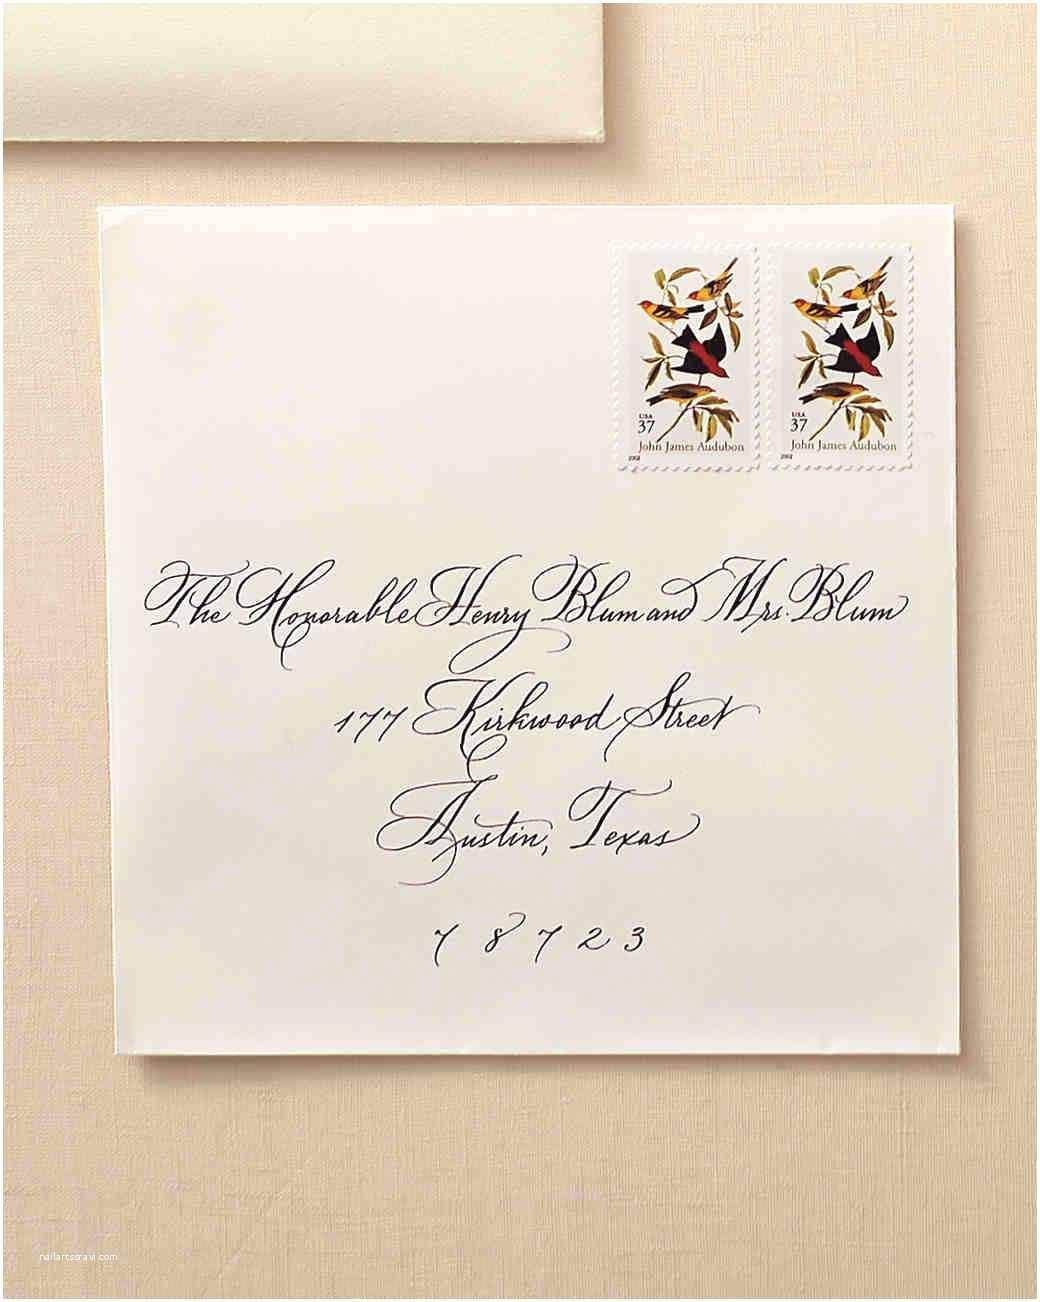 Wedding Invitation Addressing Service How to Address Guests On Wedding Invitation Envelopes